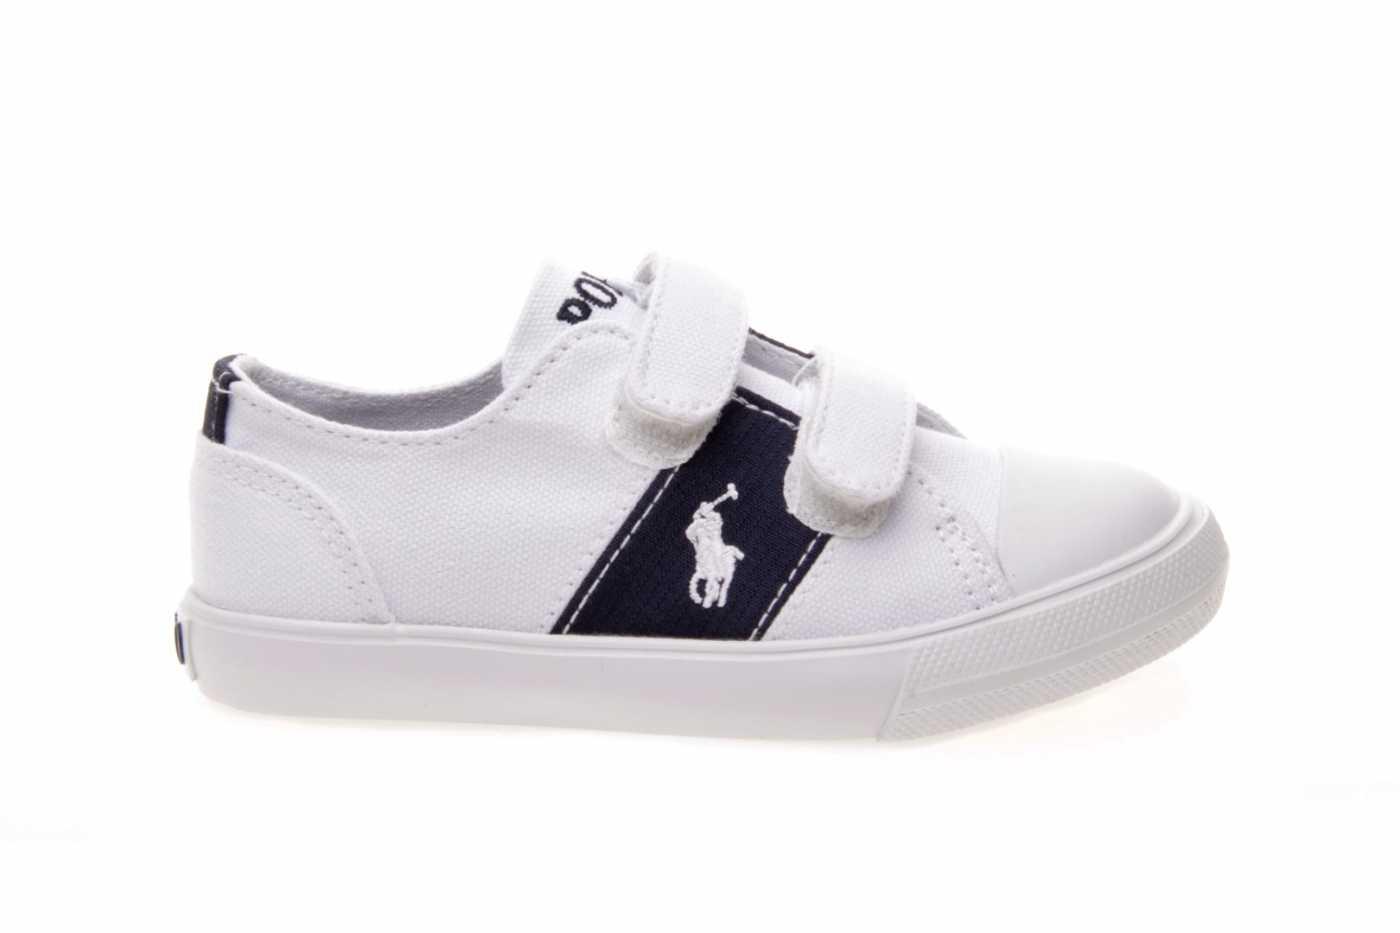 11e3b5cdebd9a Comprar zapato tipo JOVEN NIÑO estilo BLUCHER COLOR BLANCO LONA ...